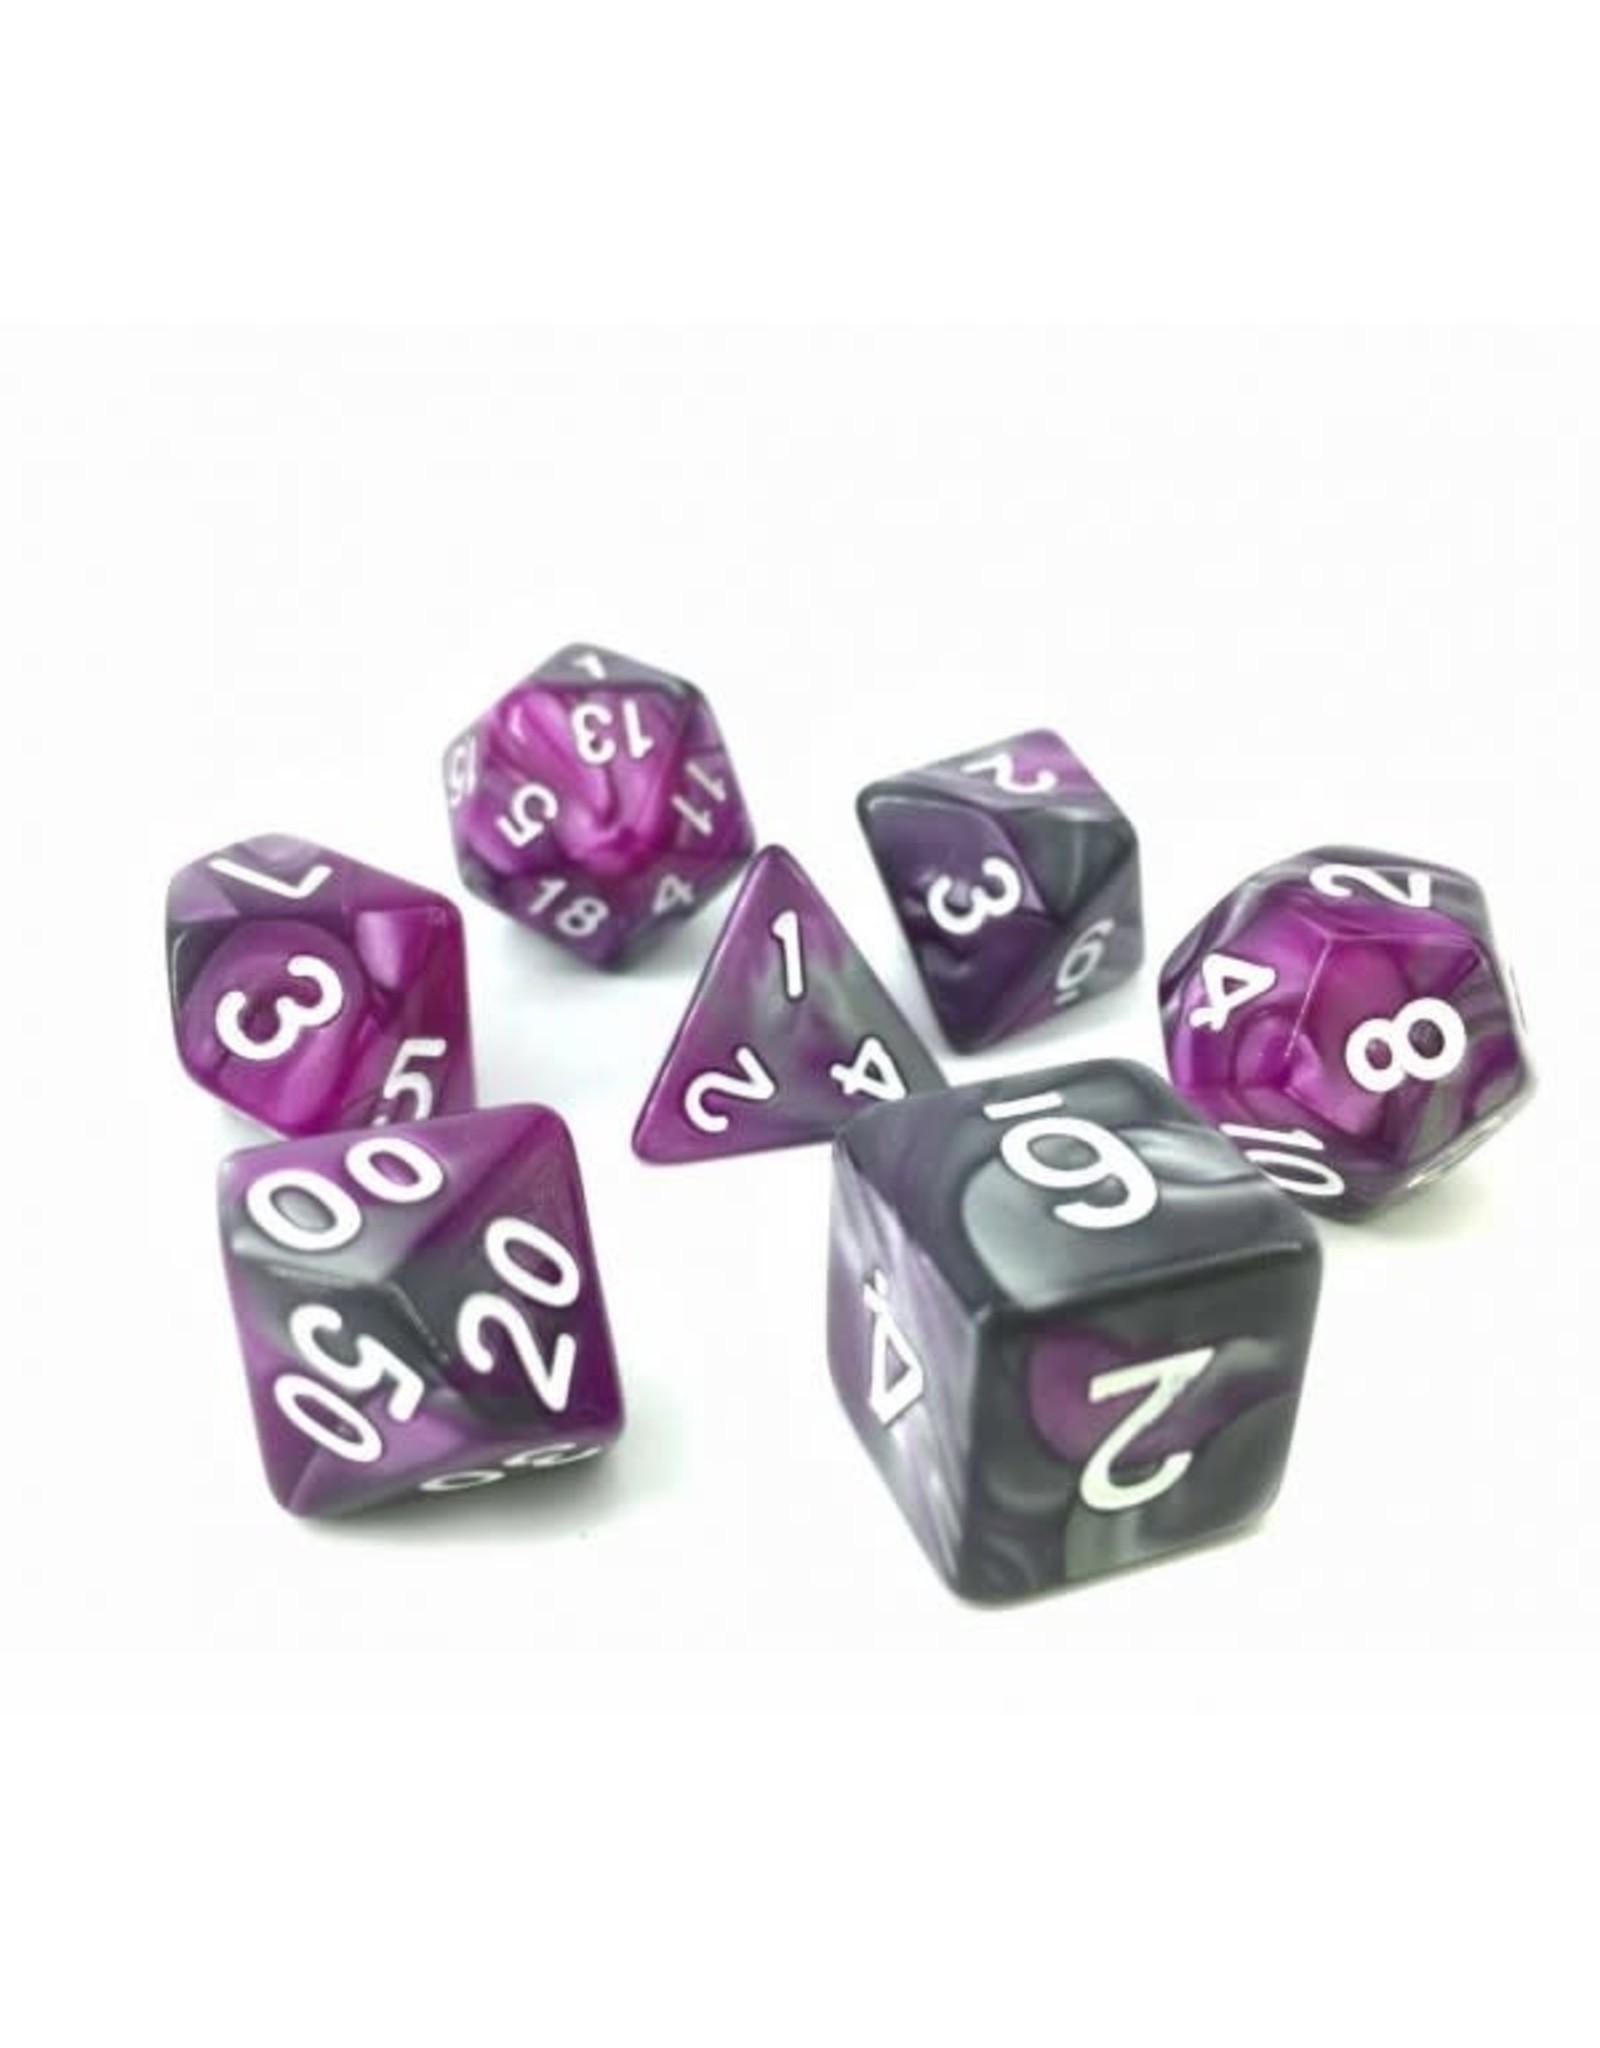 HD Dice, LLC. Blend Silver-Purple Poly Dice (7)